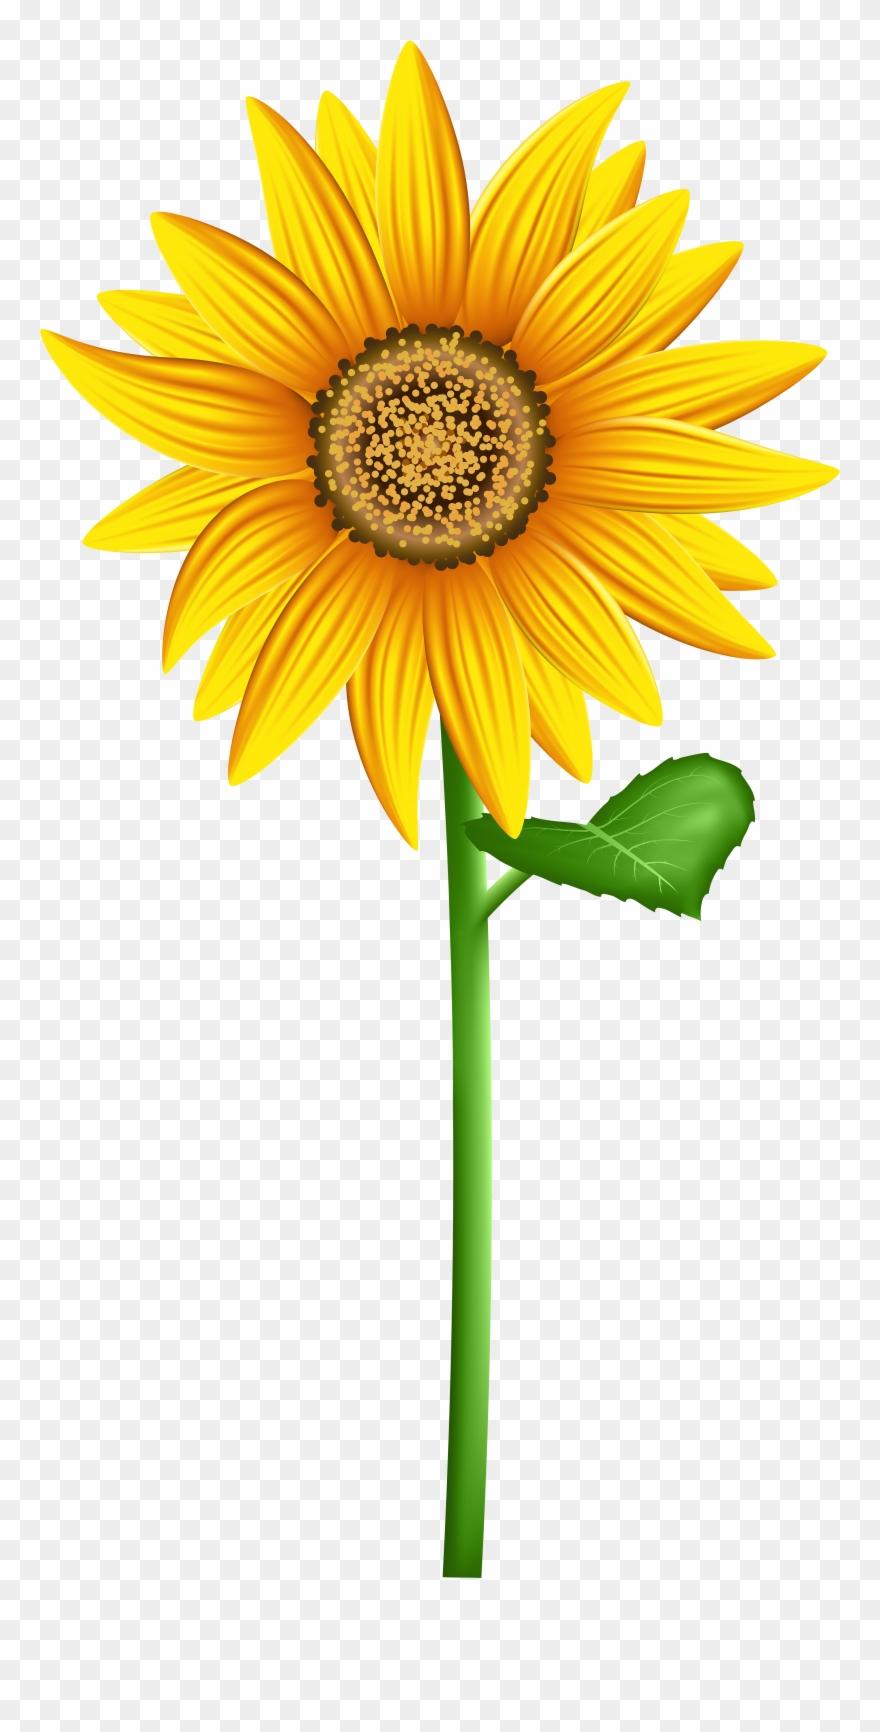 Transparent background sunflower.